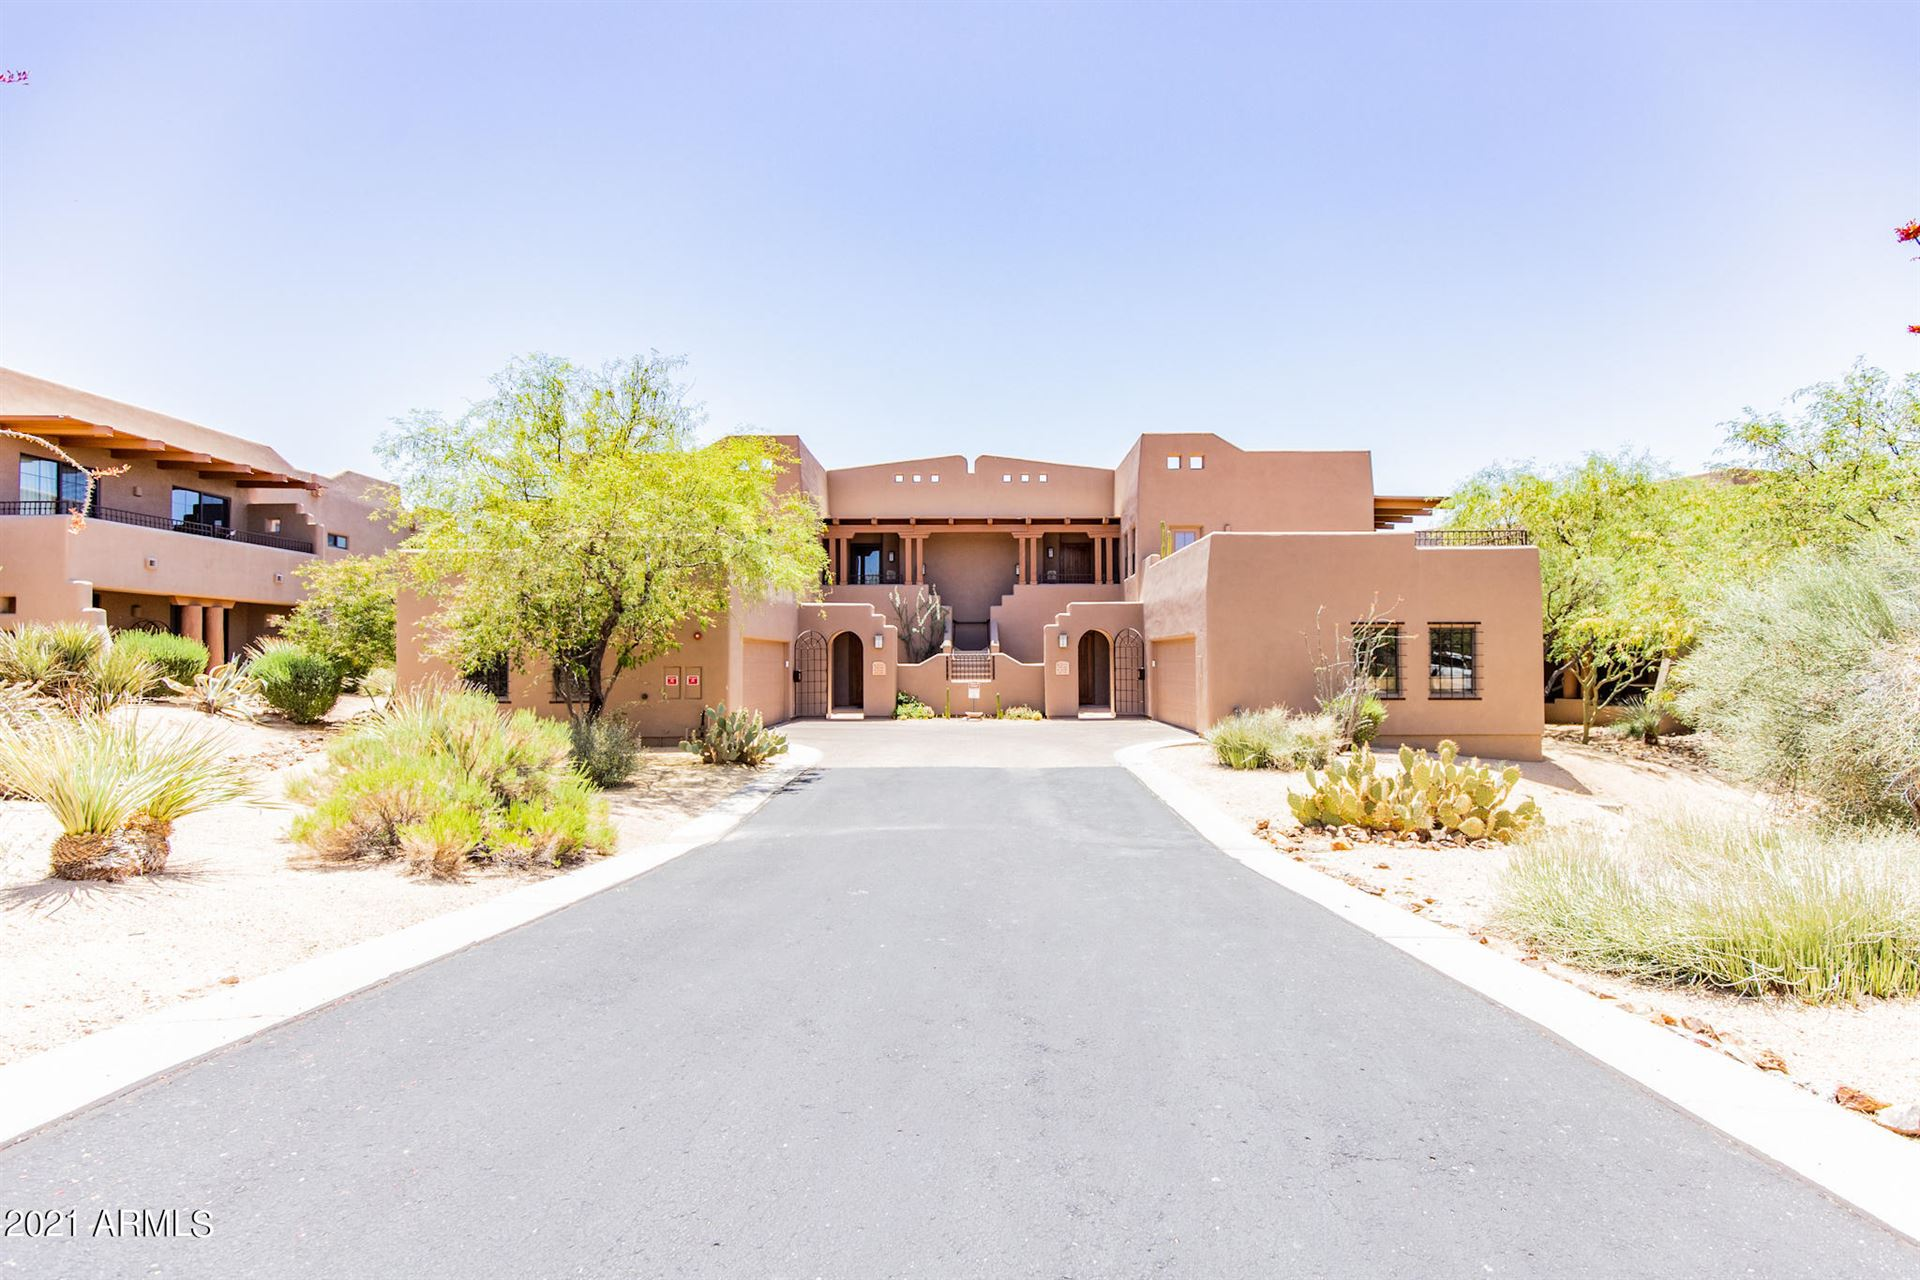 Photo of 36601 N Mule Train Road #21B1, Carefree, AZ 85377 (MLS # 6280045)